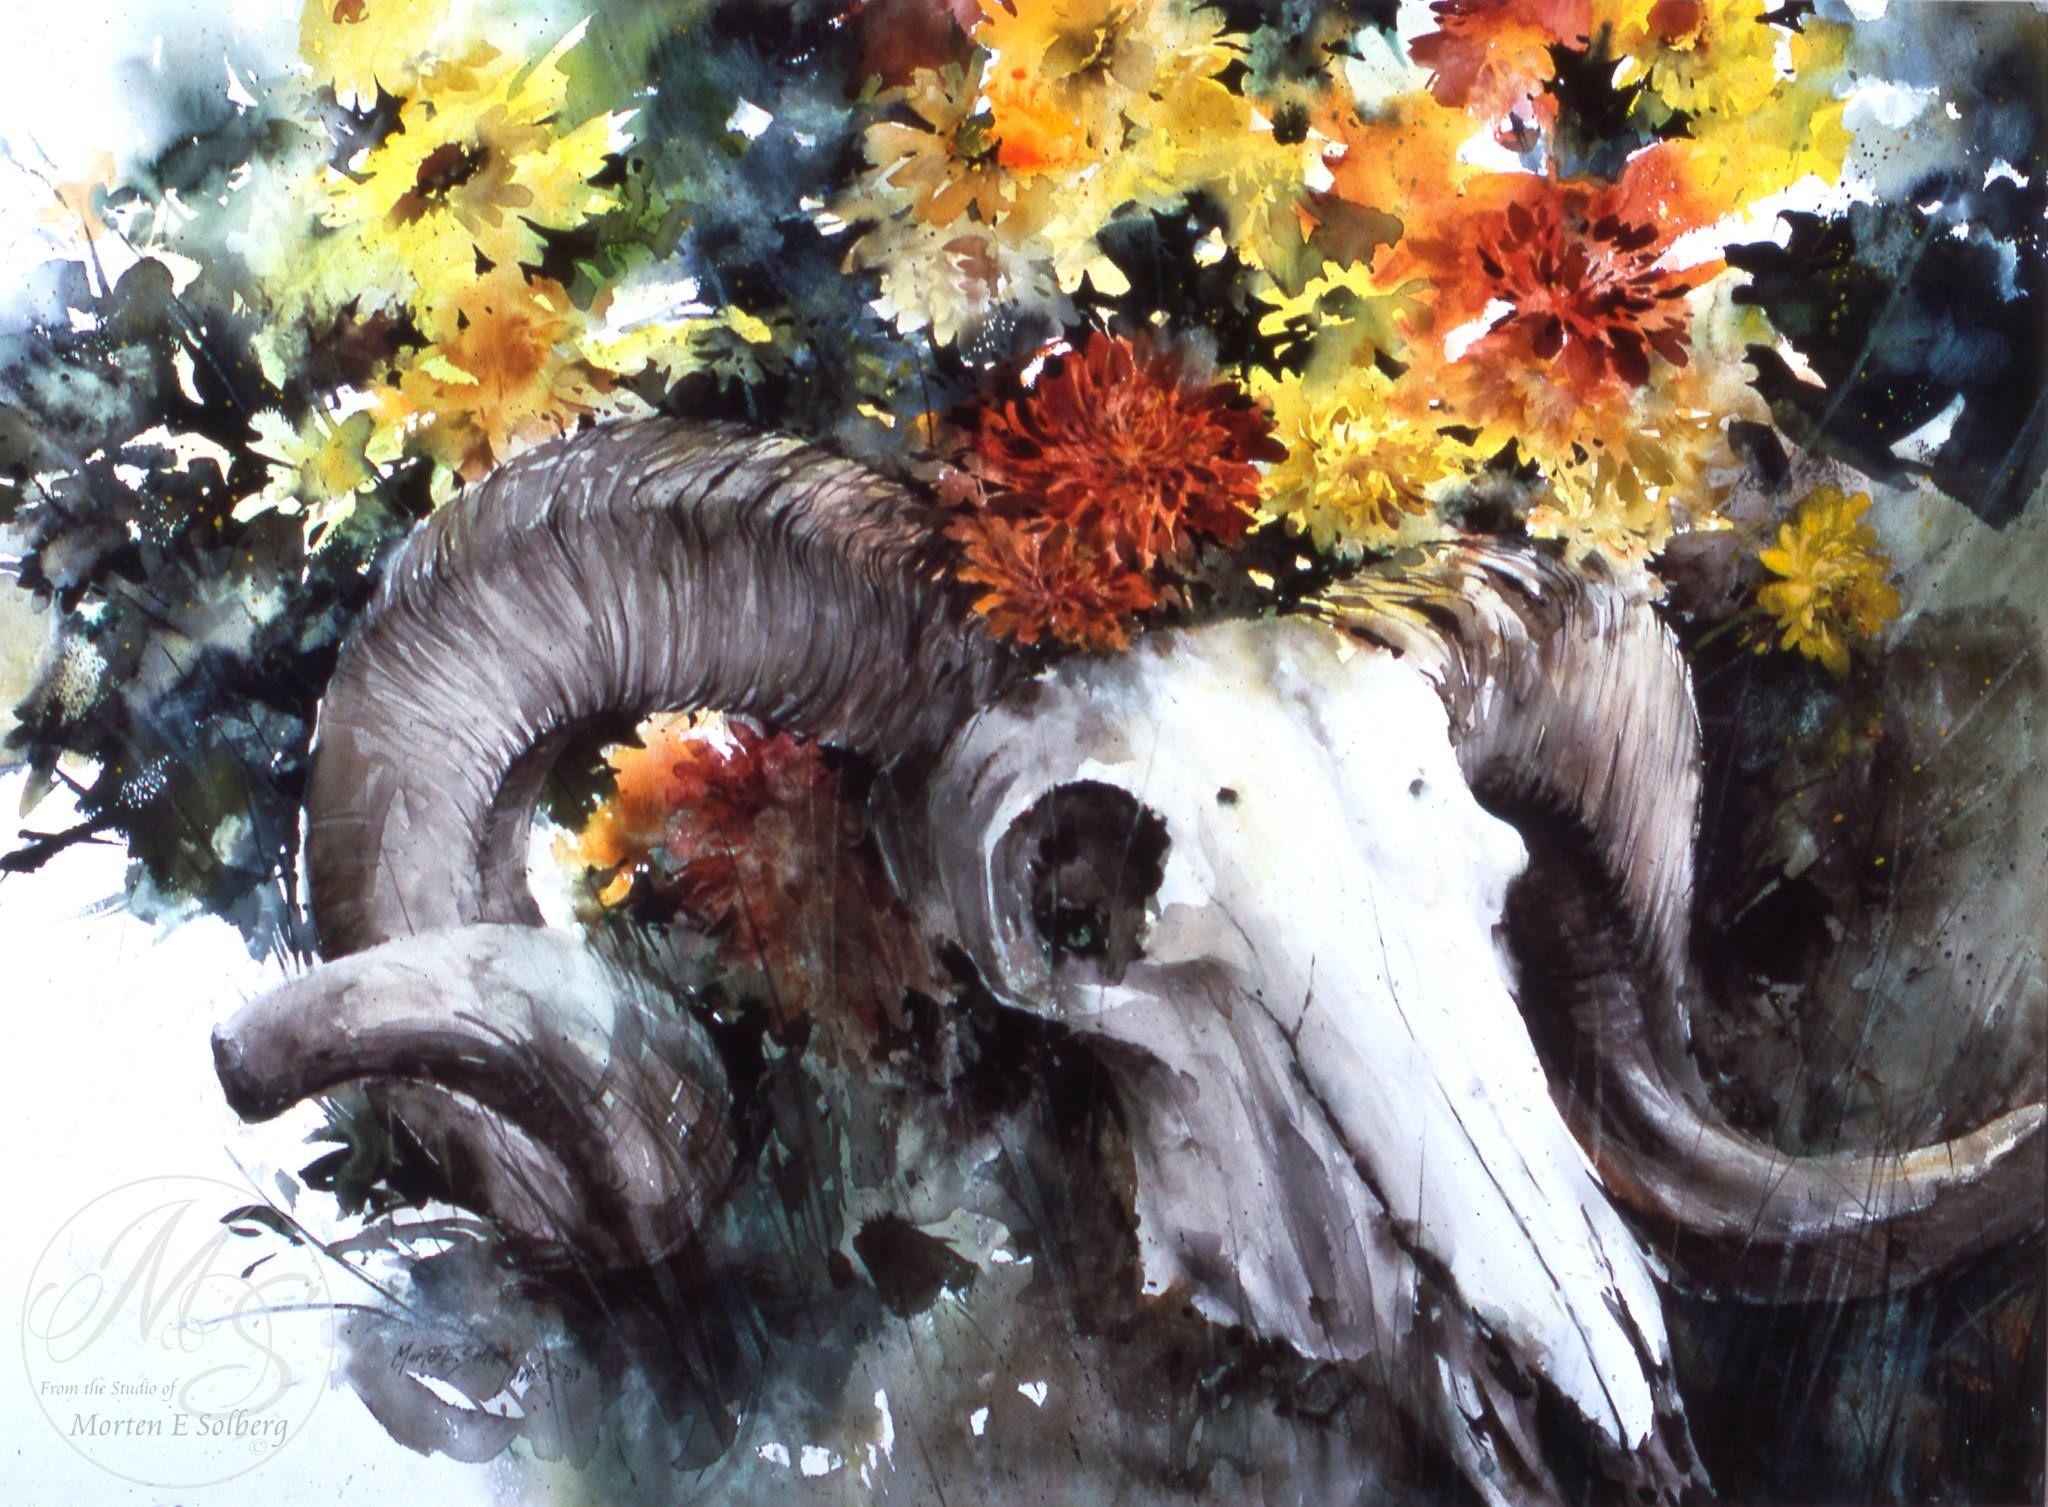 """Skull and Flower Demo,"" watercolor by Morten E. Solberg Sr."